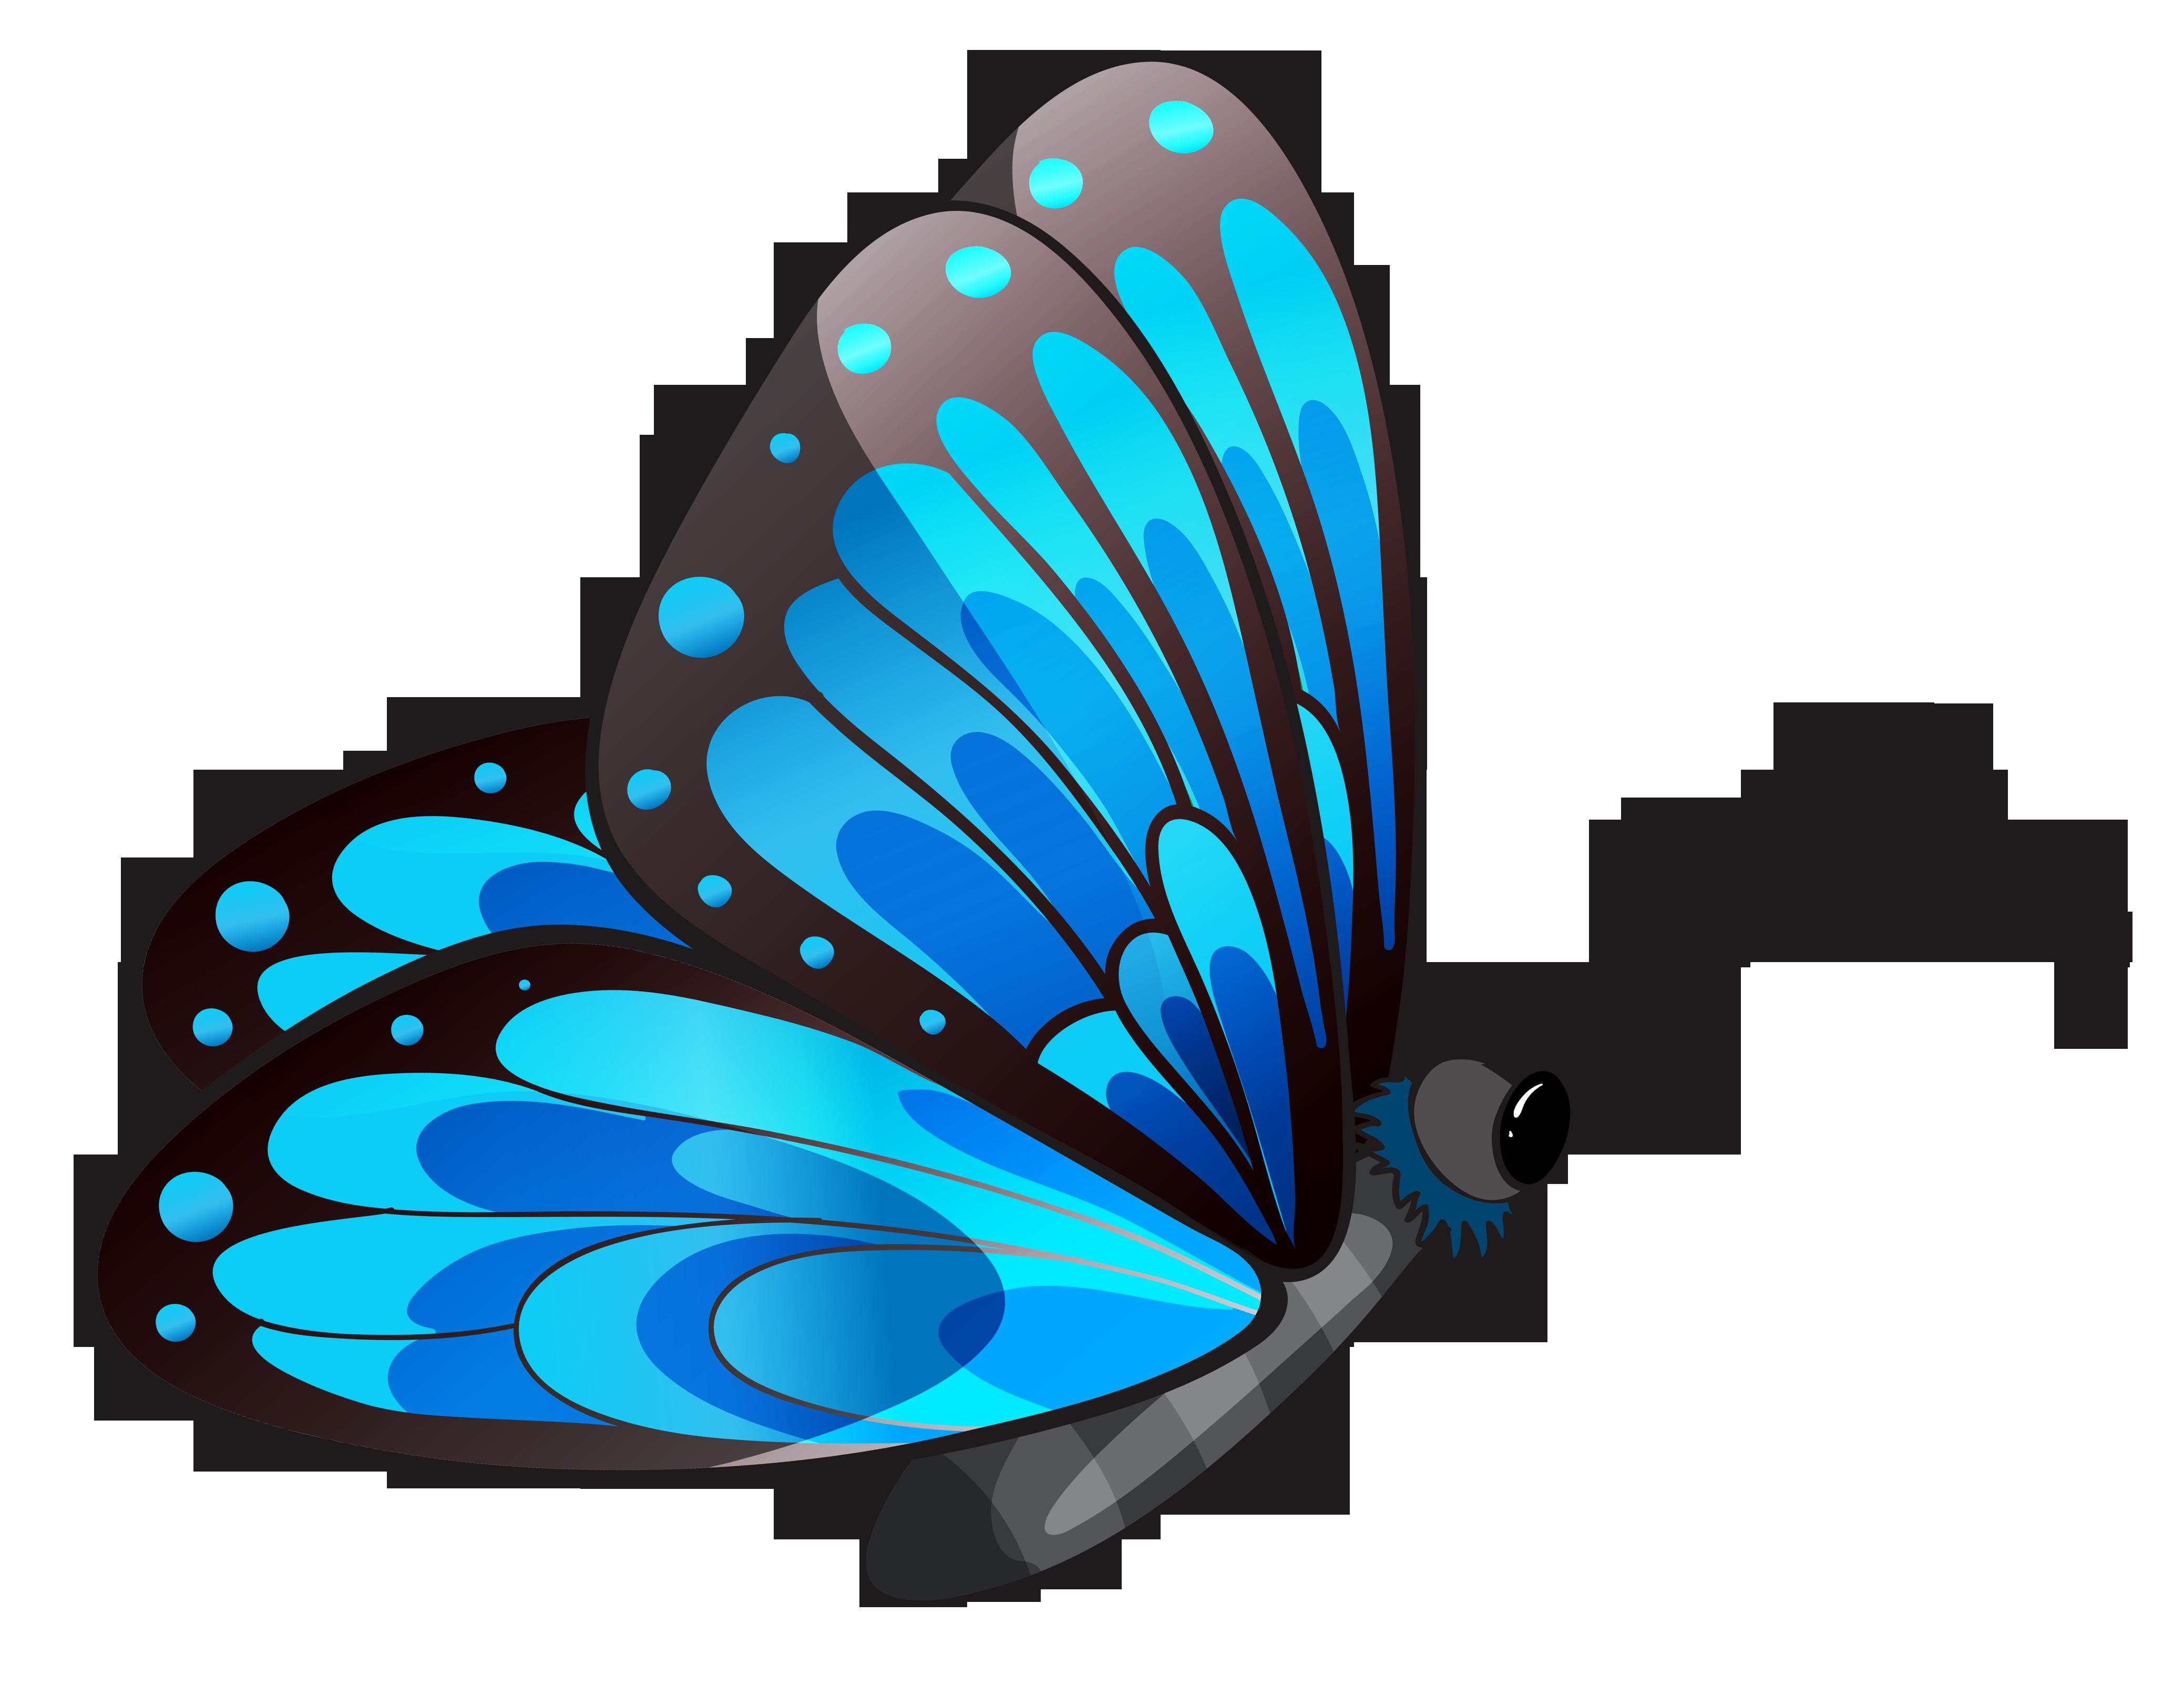 Butterfly clip art 2